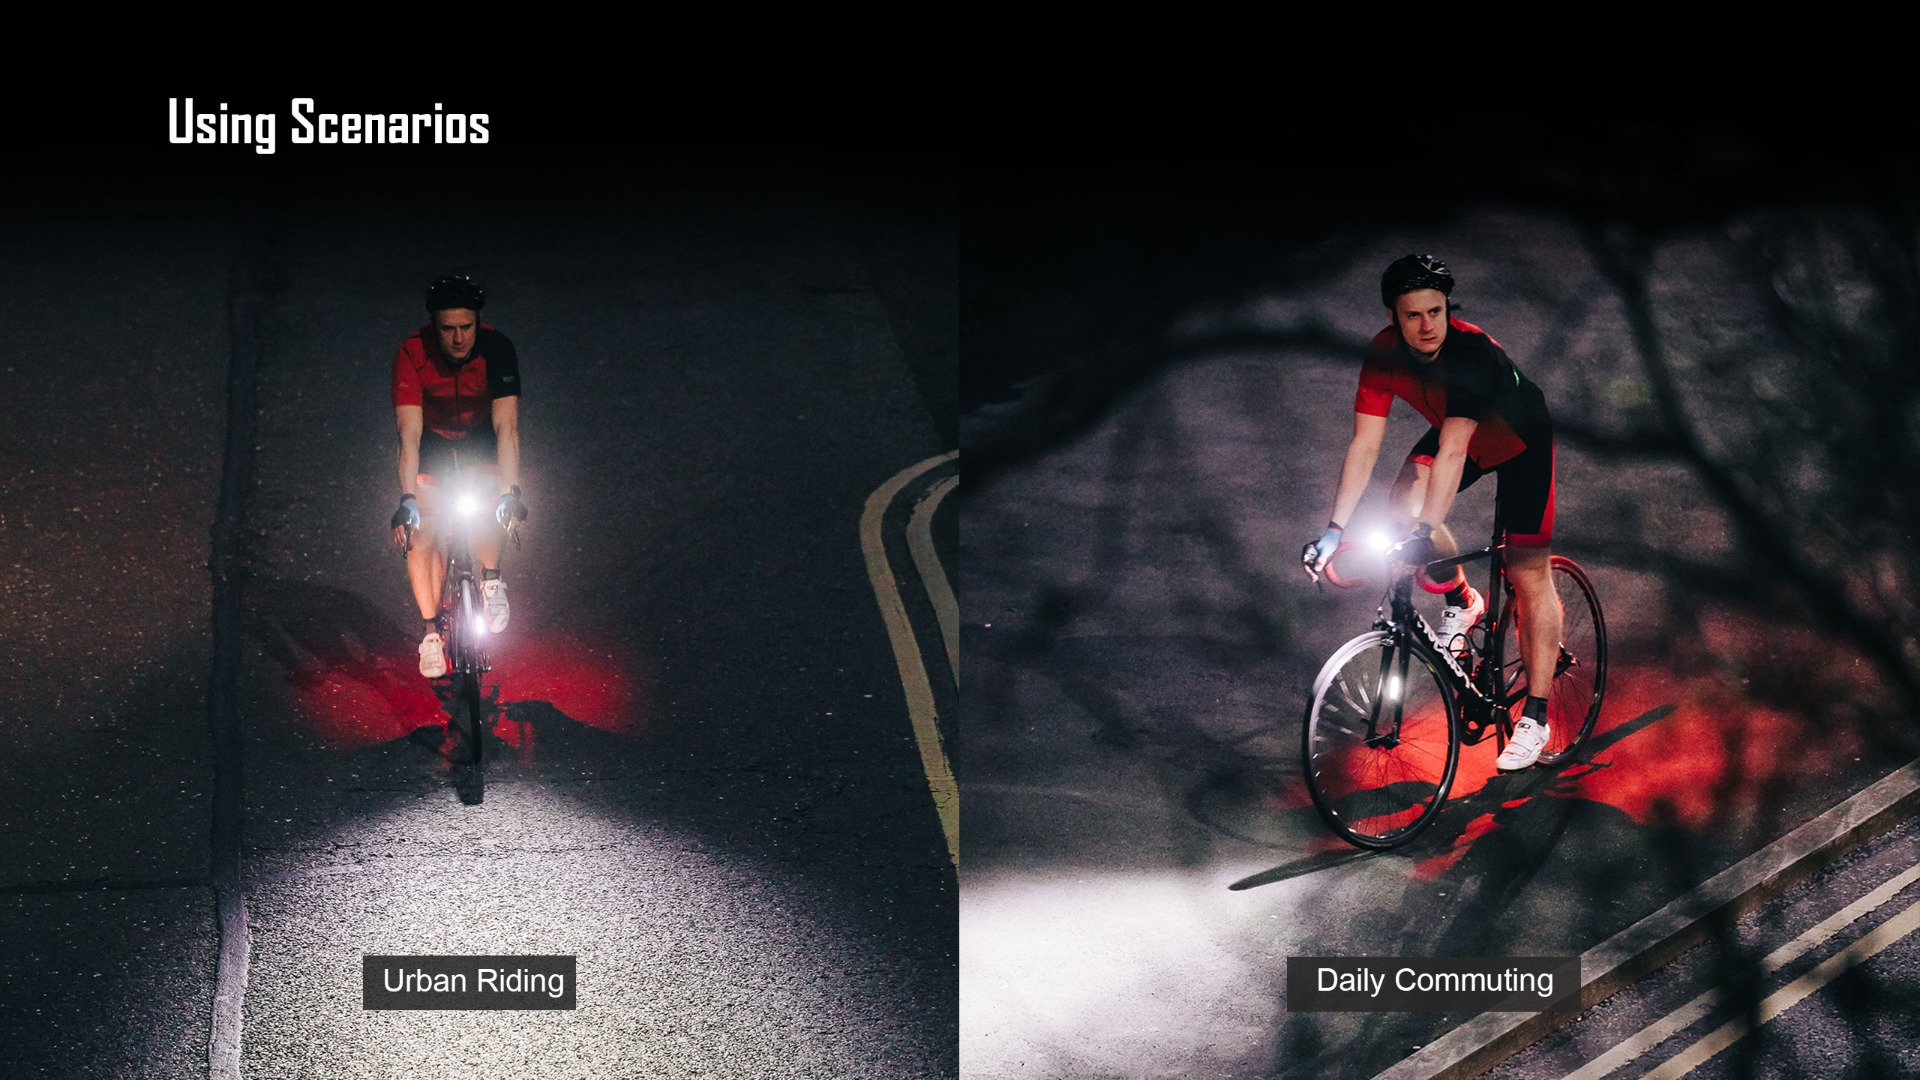 Olight RN400 bike light